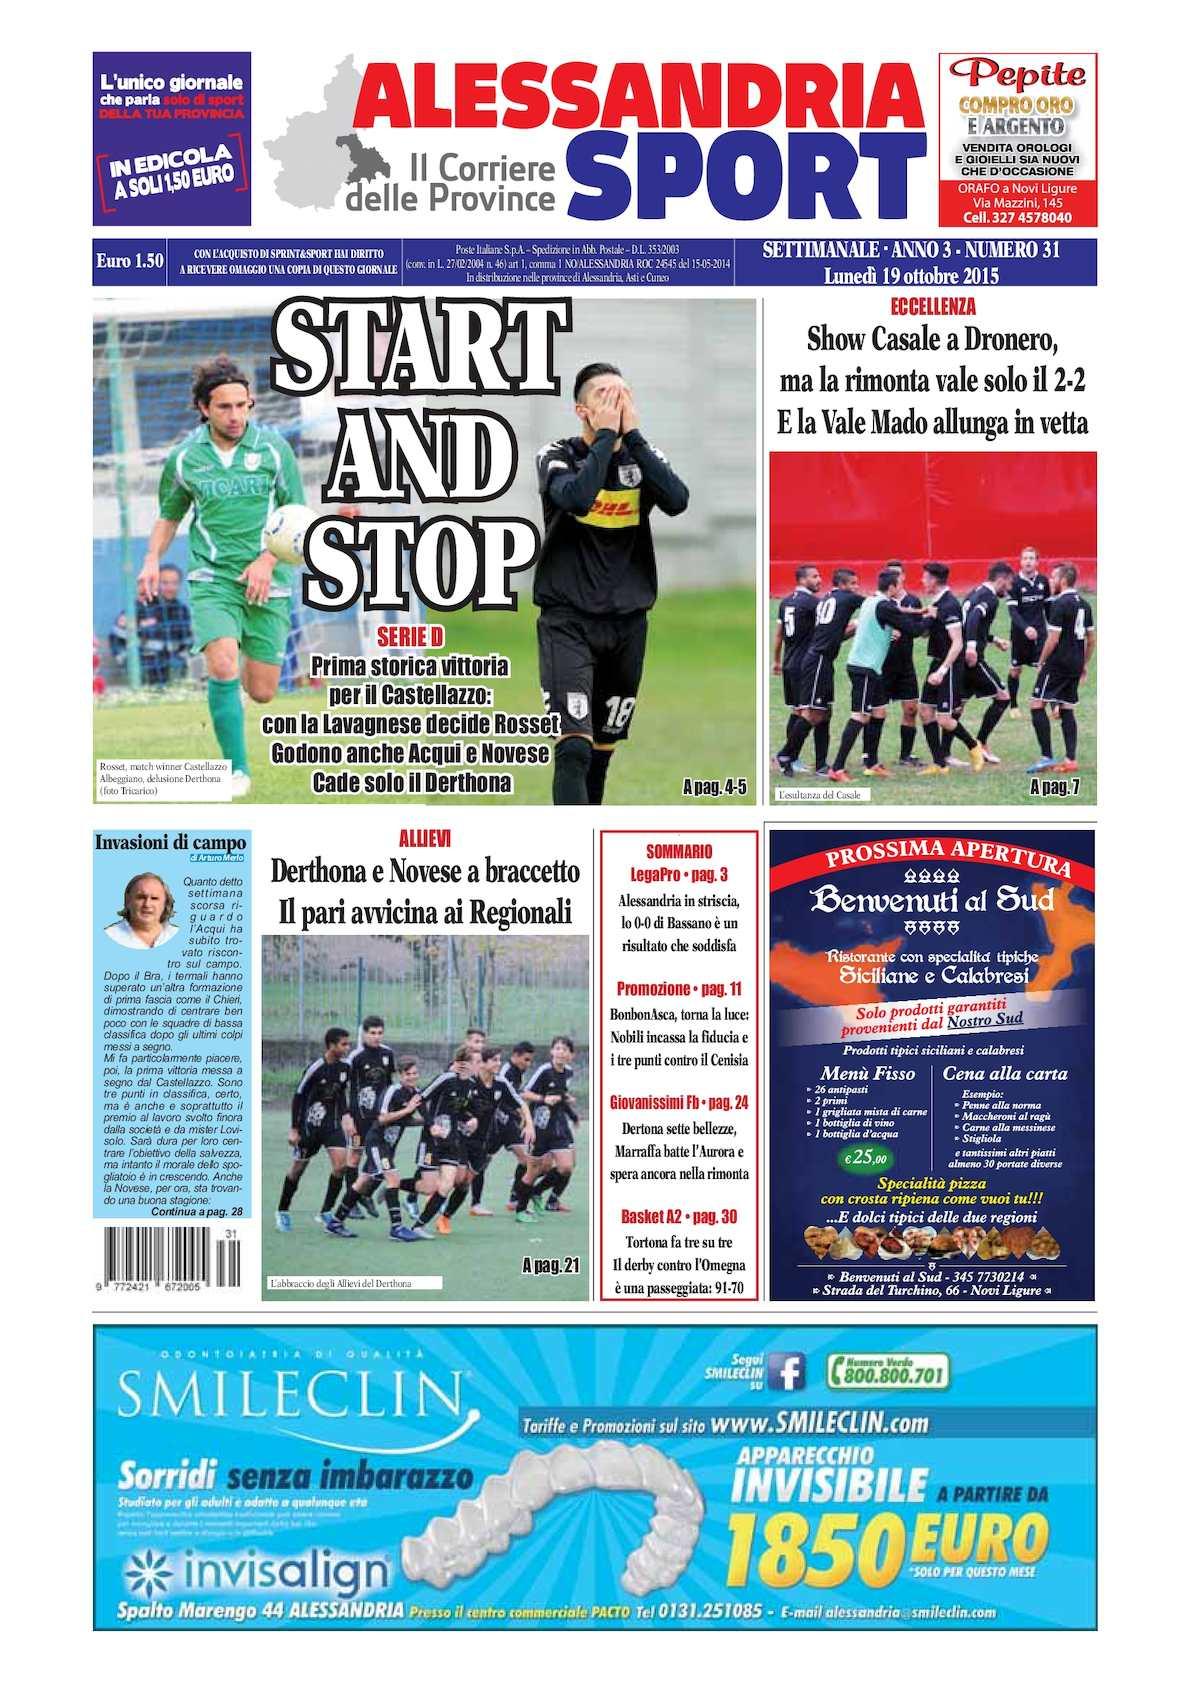 Calaméo 2015 Alessandria Sport 31